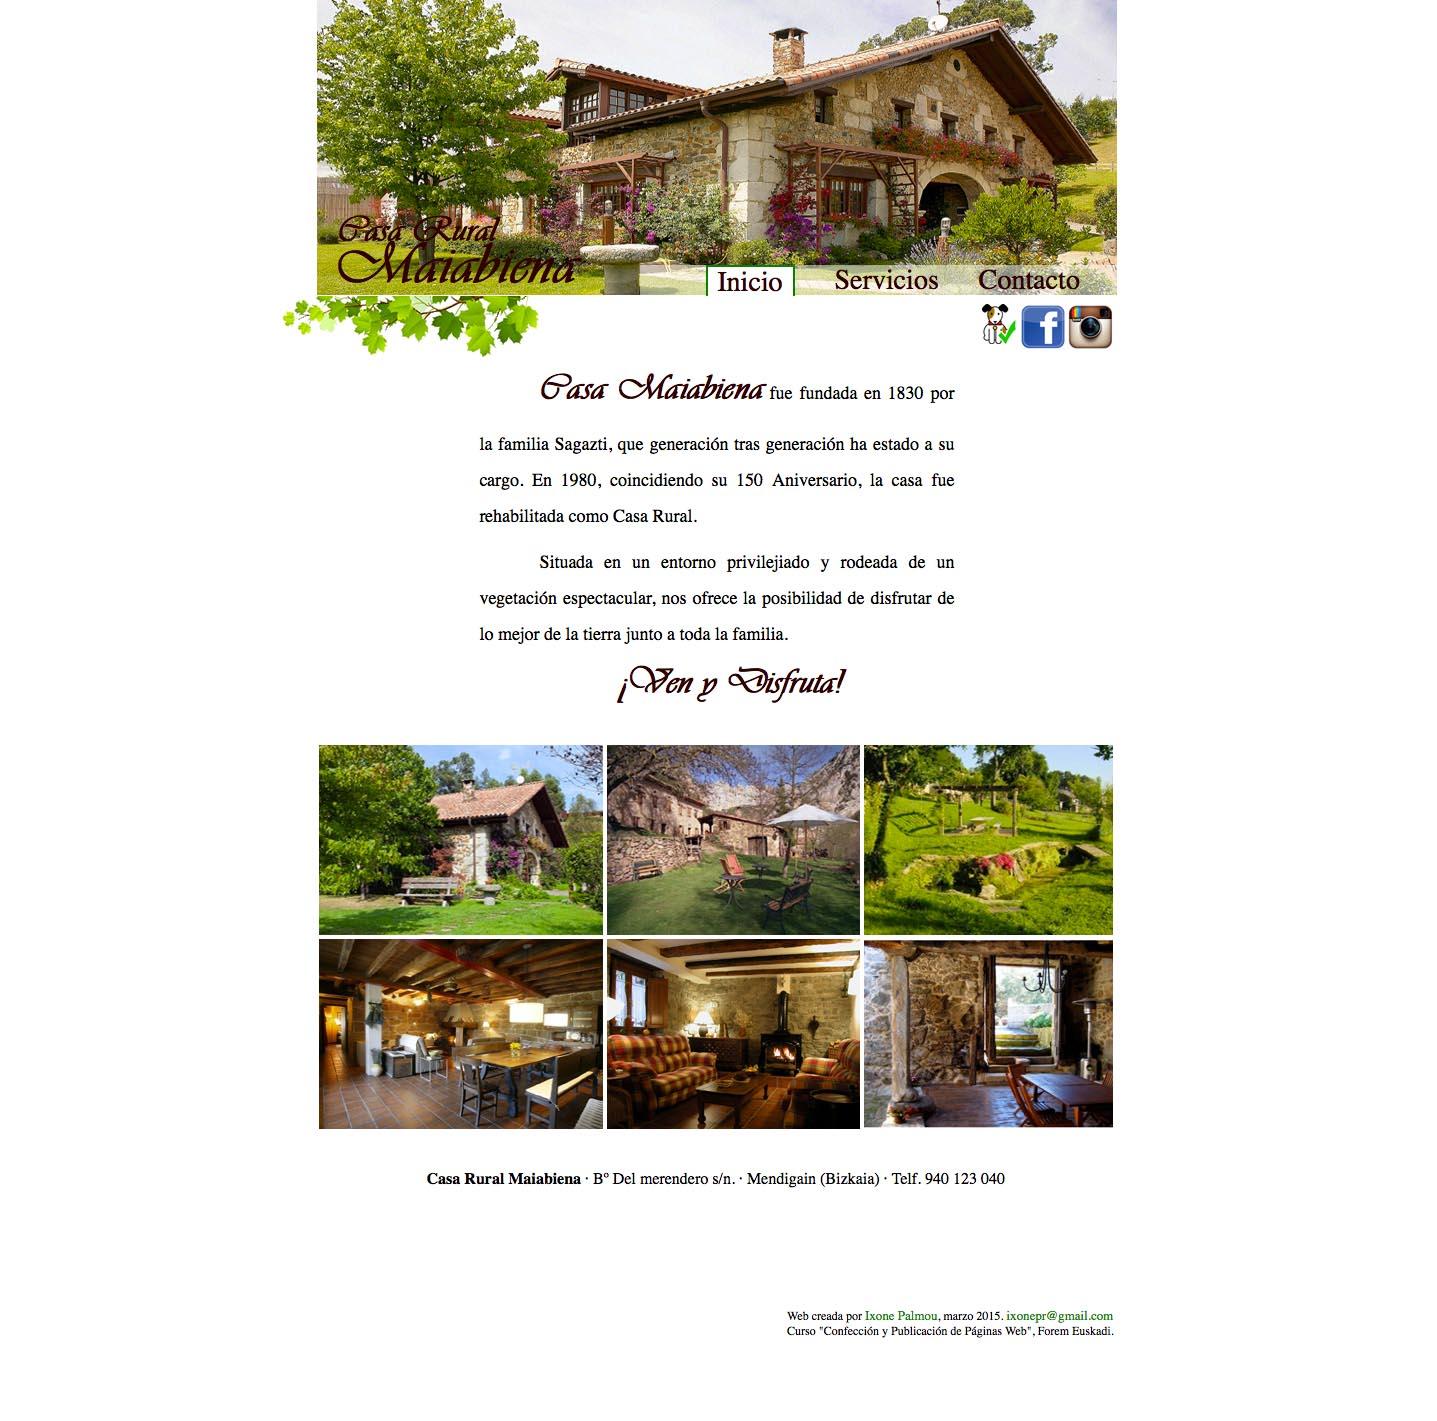 P gina web casa rural maiabiena domestika for Casa piscitelli pagina web